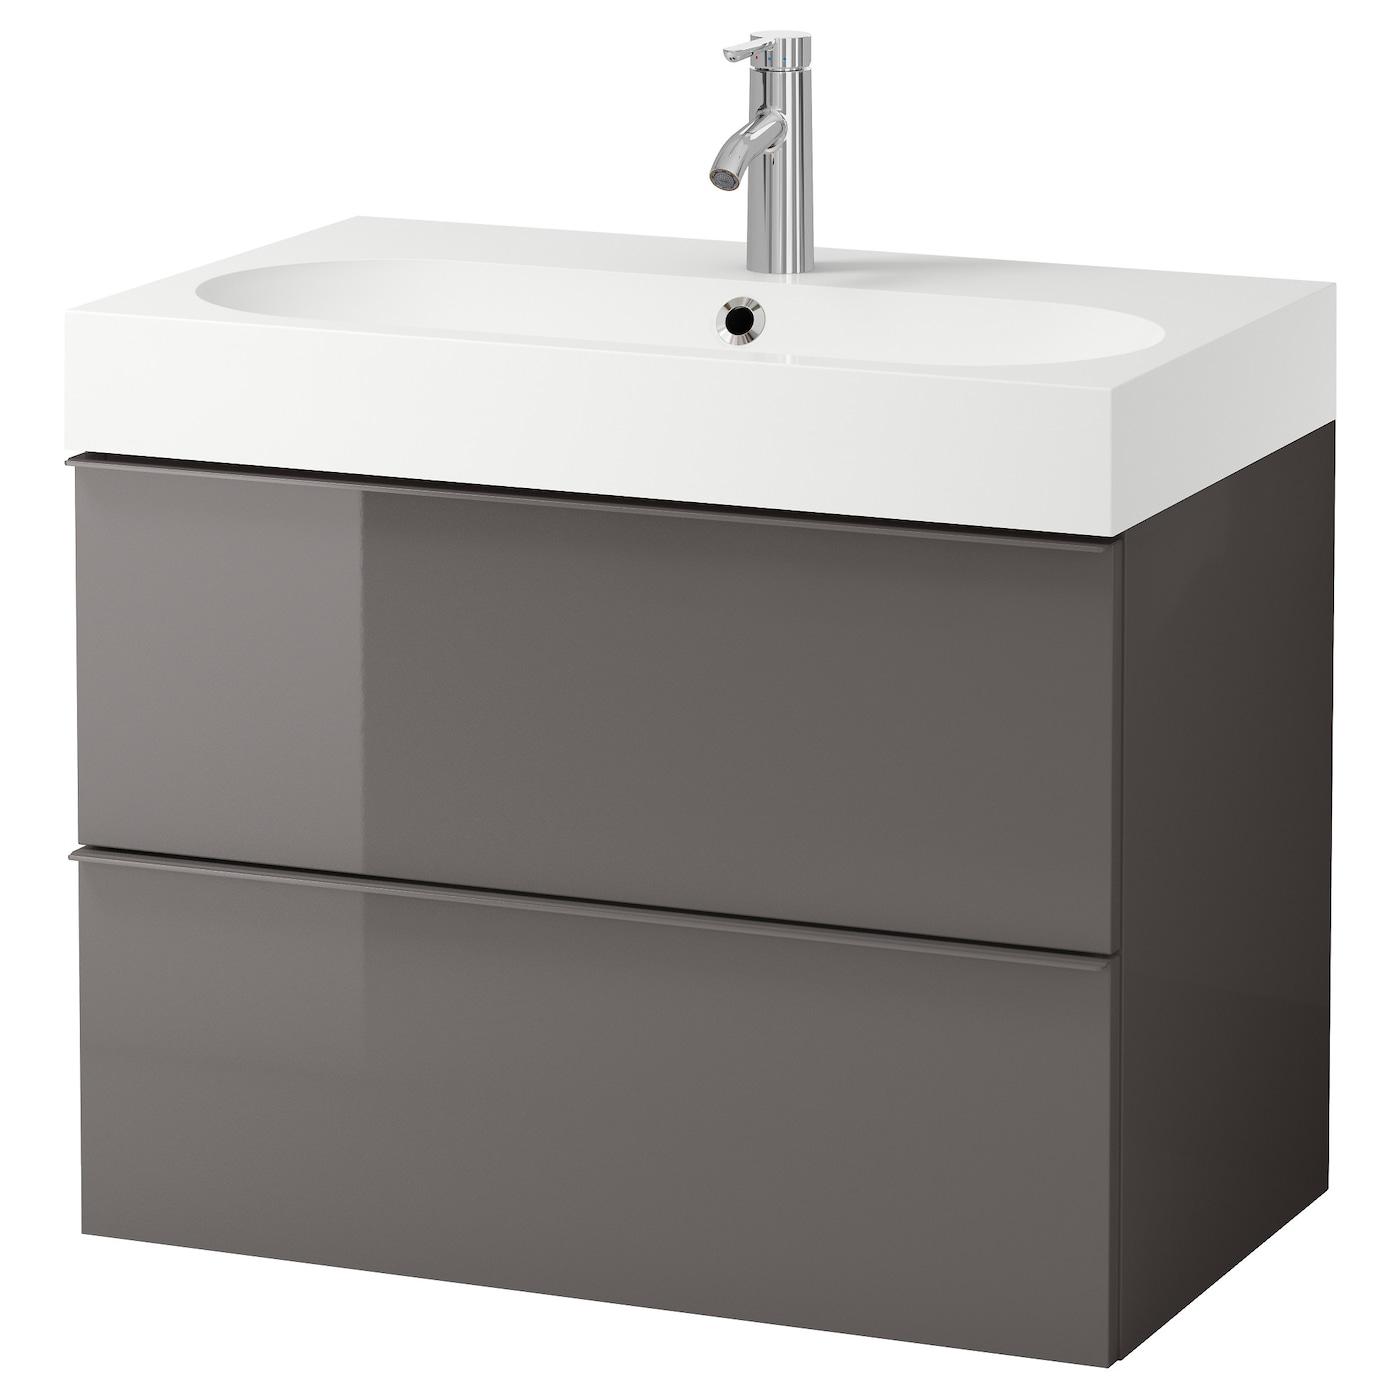 br viken godmorgon armario lavabo 2 cajones alto brillo gris 80 x 48 x 68 cm ikea. Black Bedroom Furniture Sets. Home Design Ideas